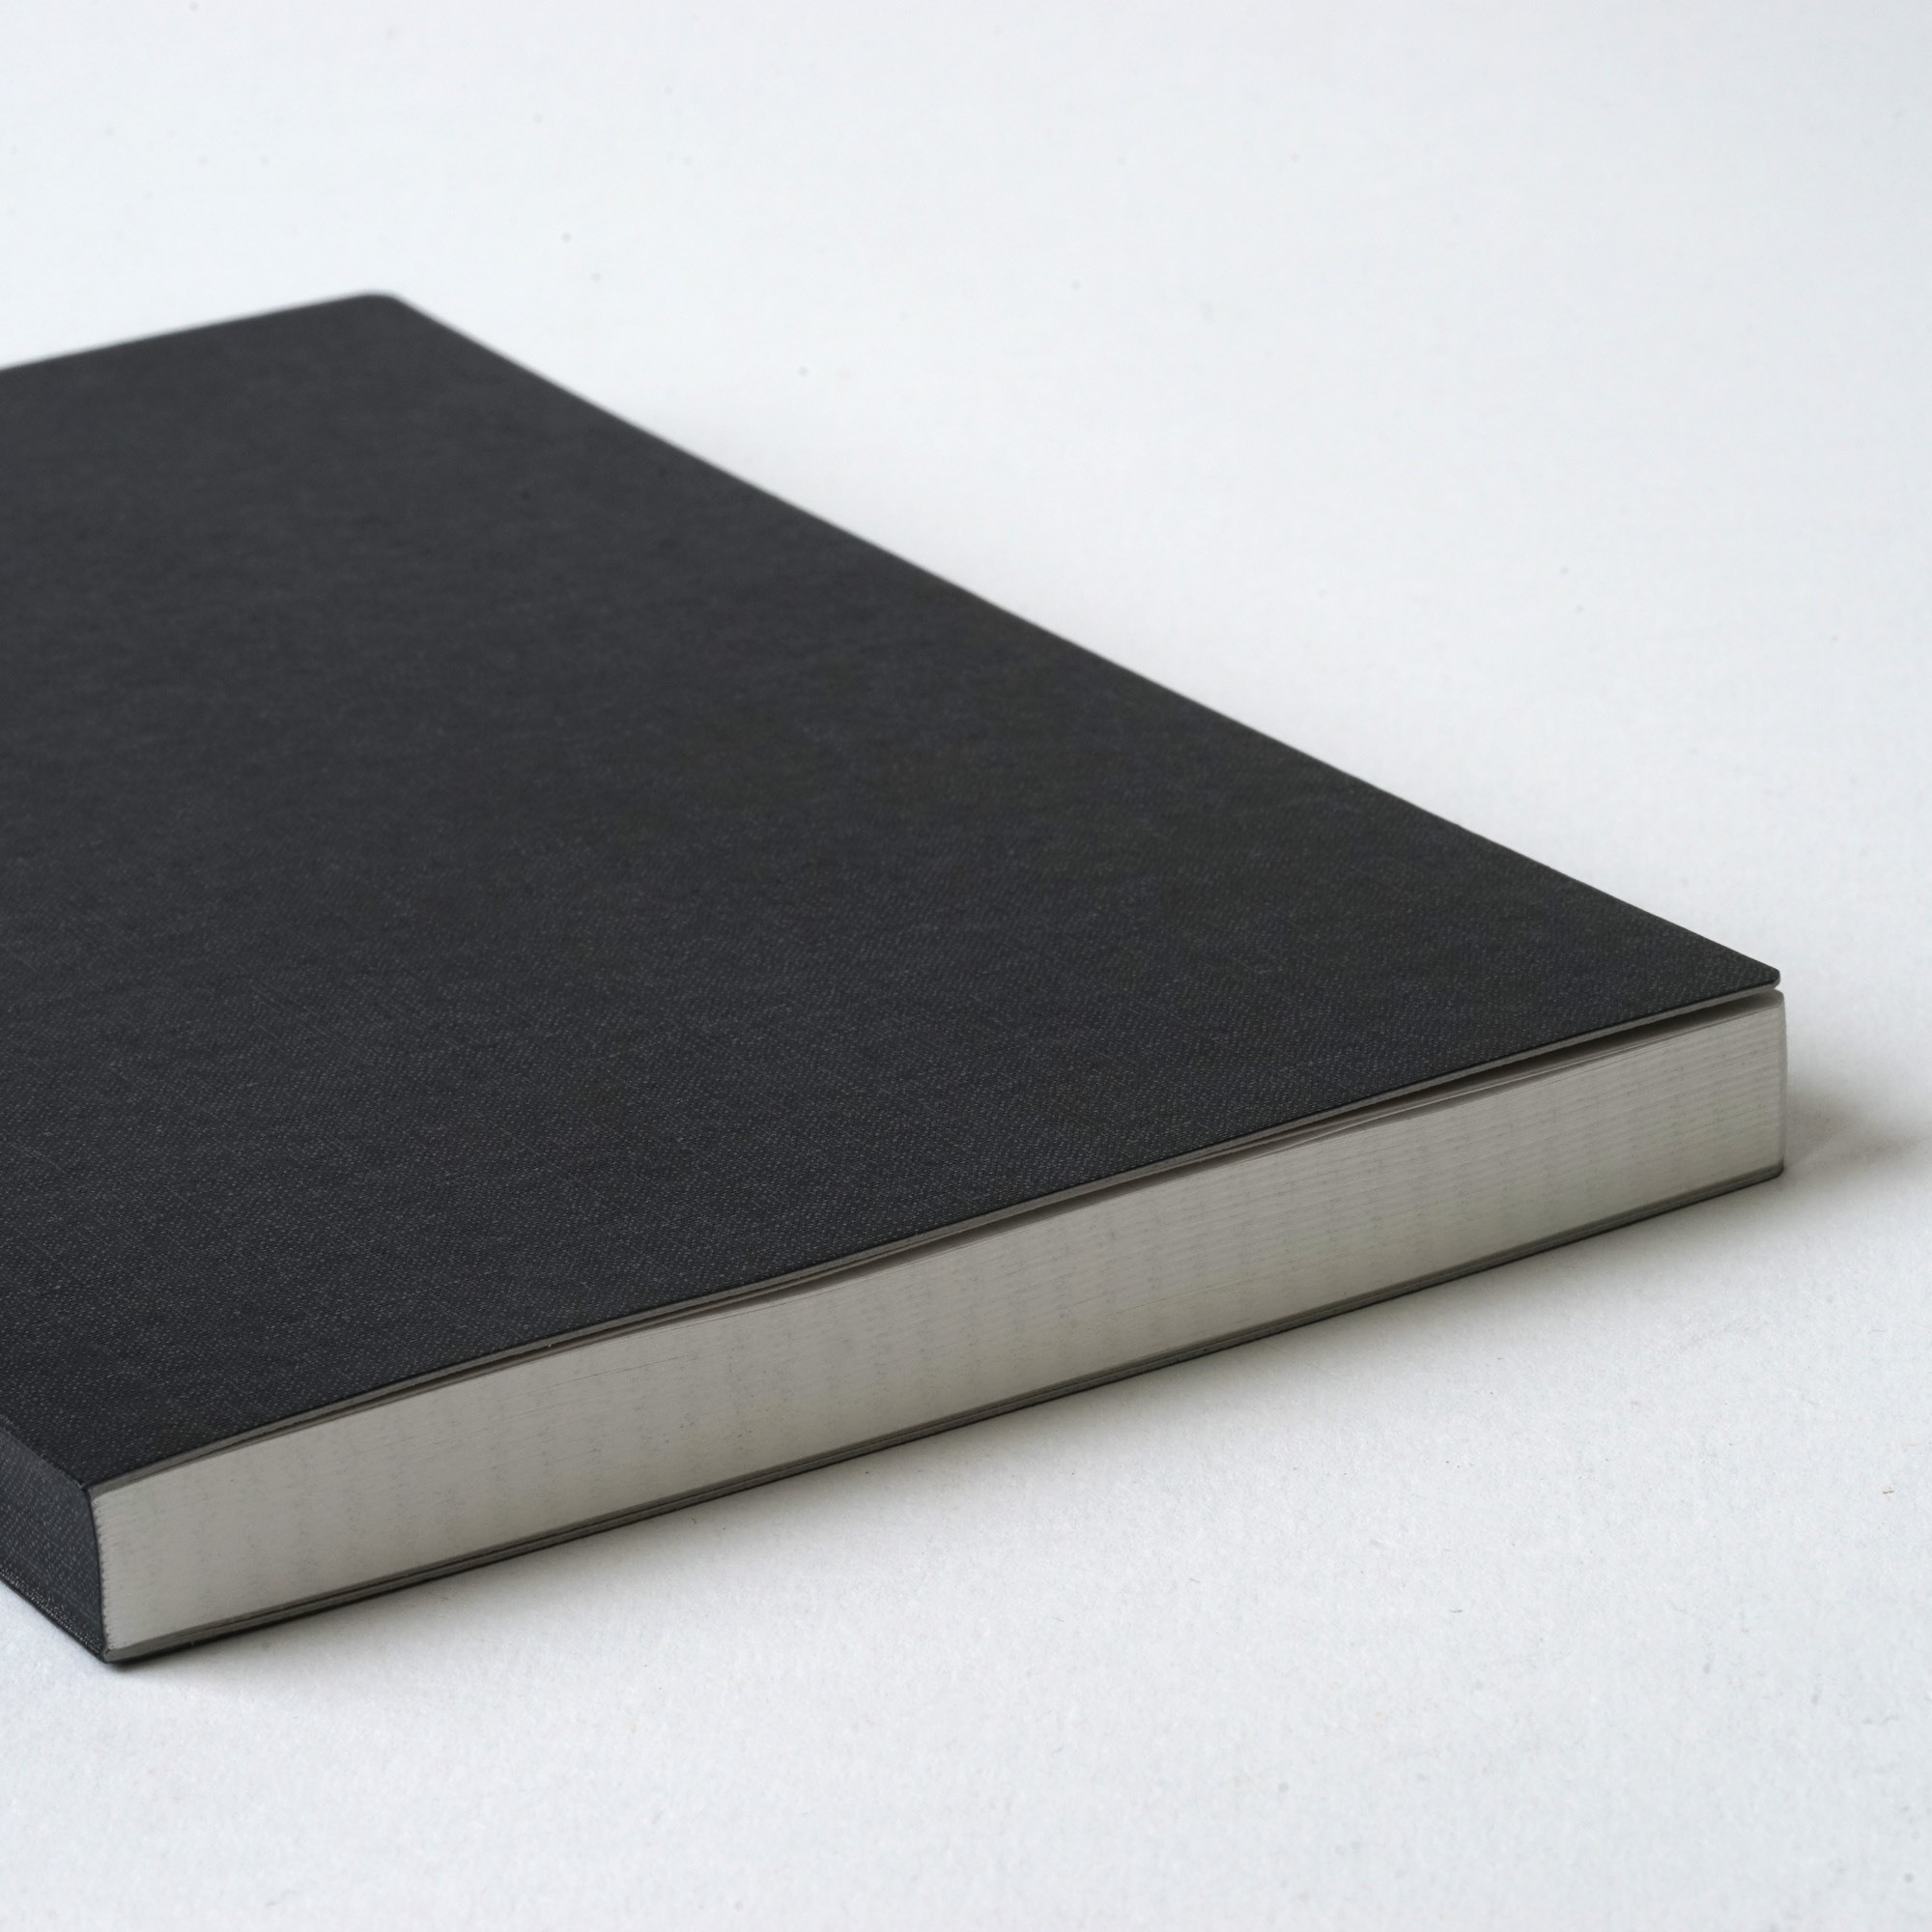 Ito Bindery Блокнот в клетку Grid A5 Slim Black